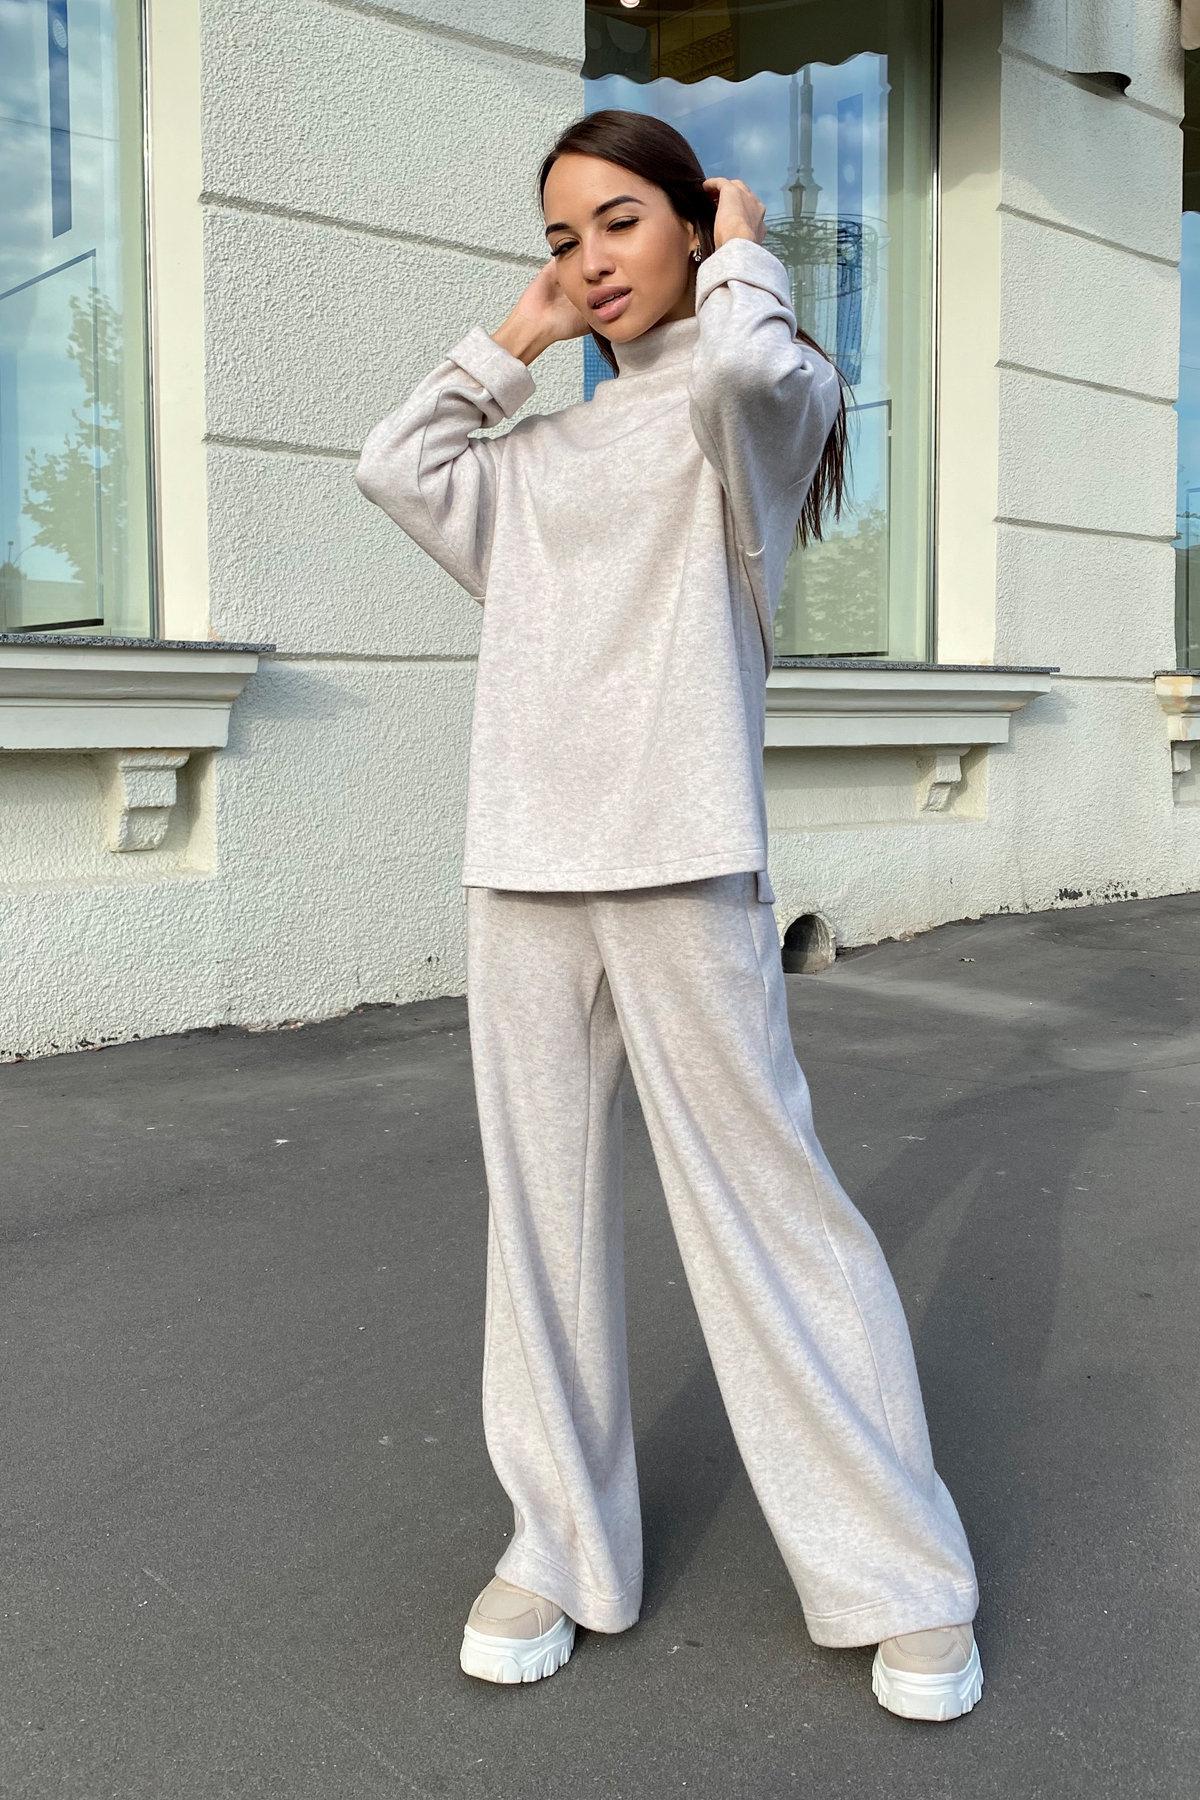 Лав Ю костюм из ангоры 9806 АРТ. 46372 Цвет: Бежевый 23 - фото 2, интернет магазин tm-modus.ru